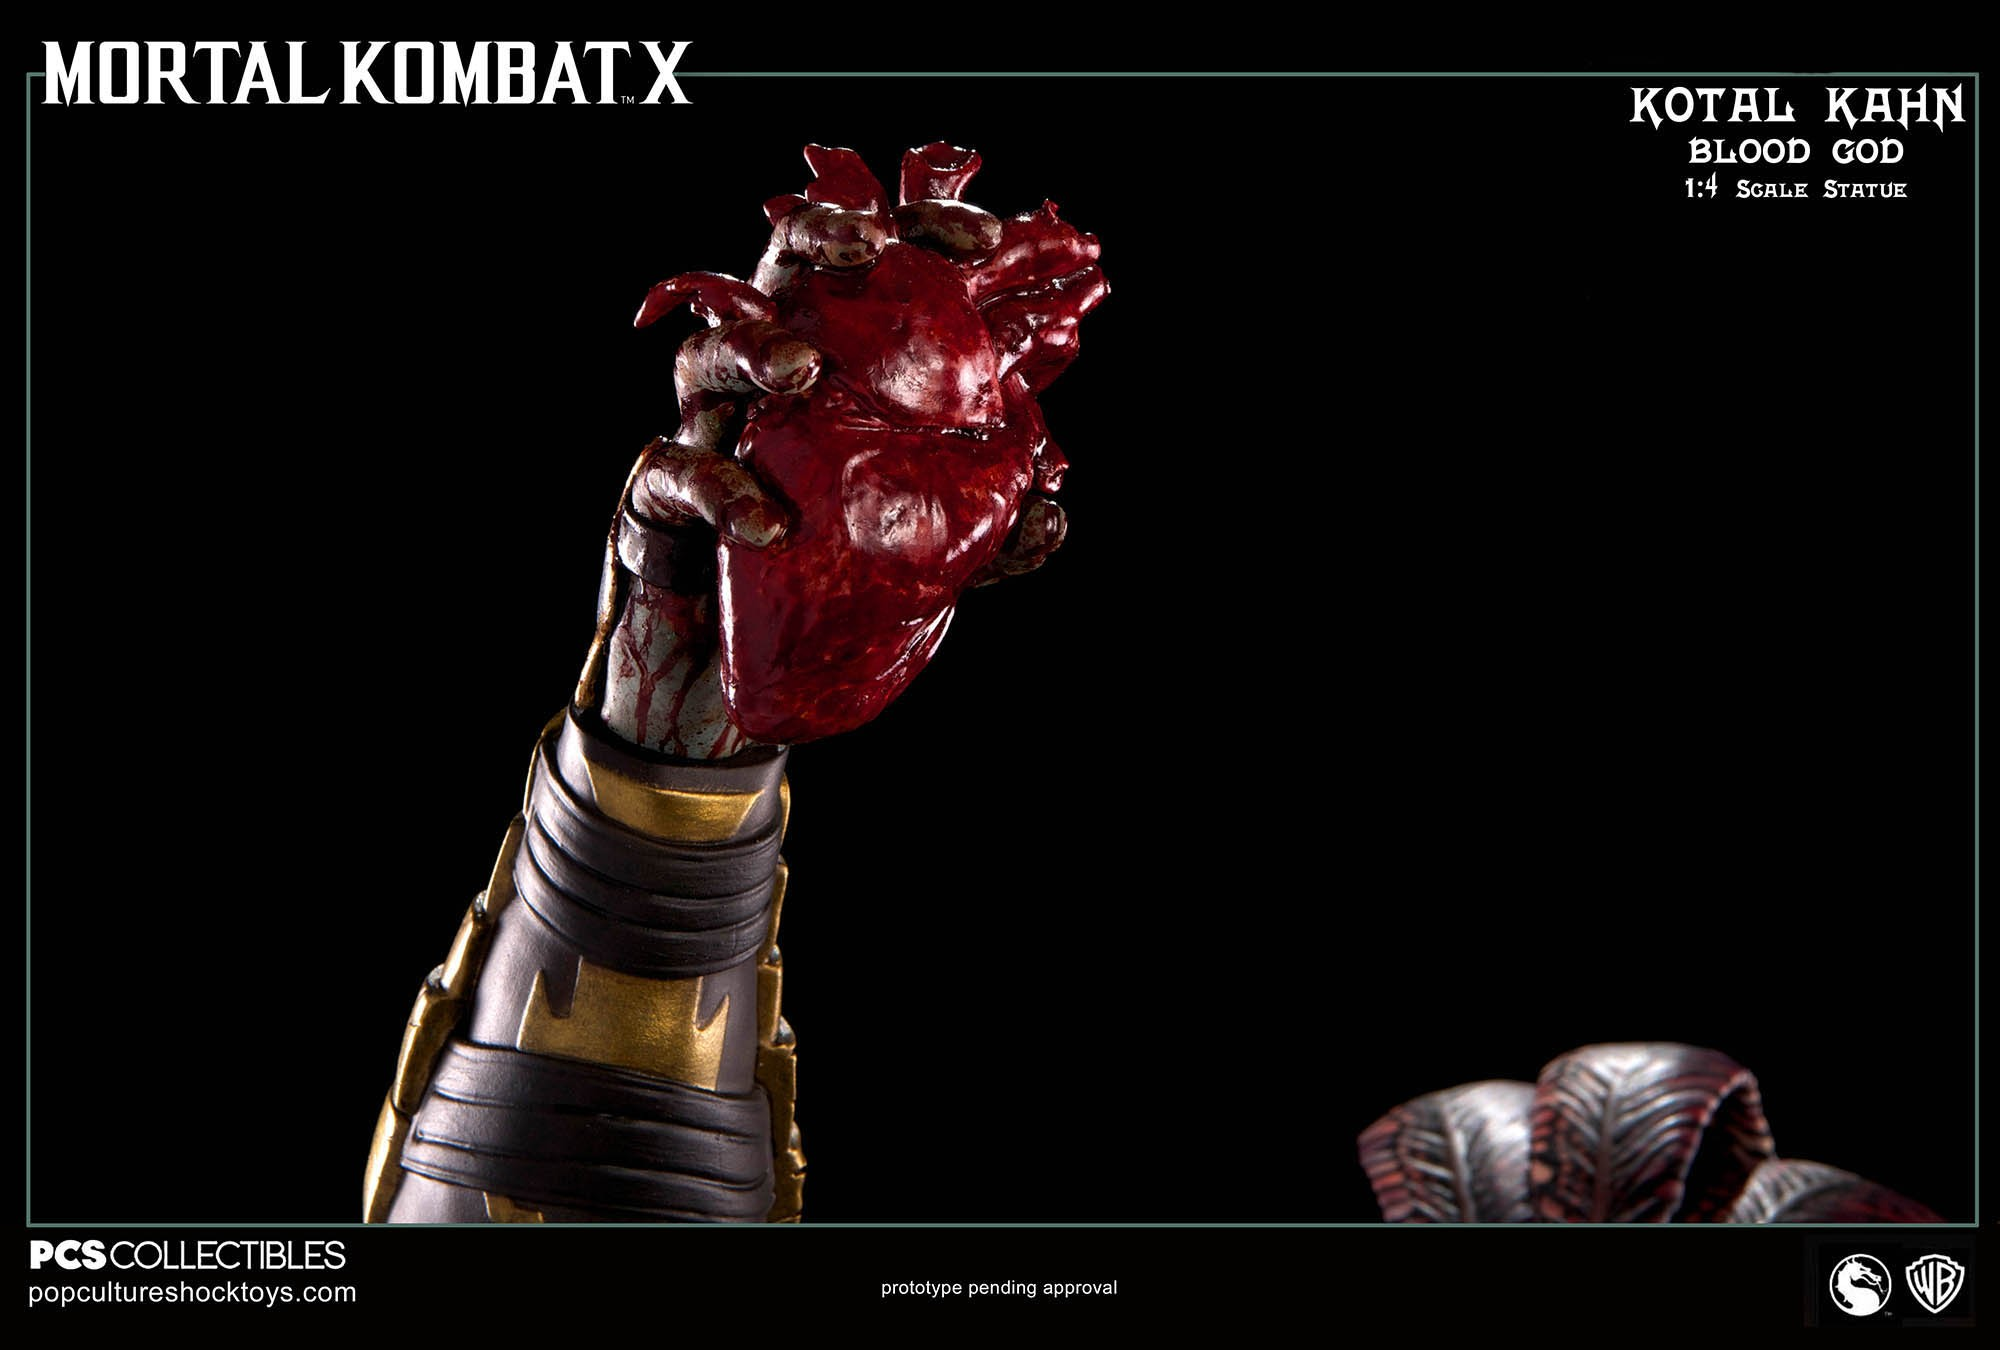 [Pop Culture Shock] Mortal Kombat X: Kotal Kahn 1:4 scale PCS-Kotal-Kahn-Blood-God-020